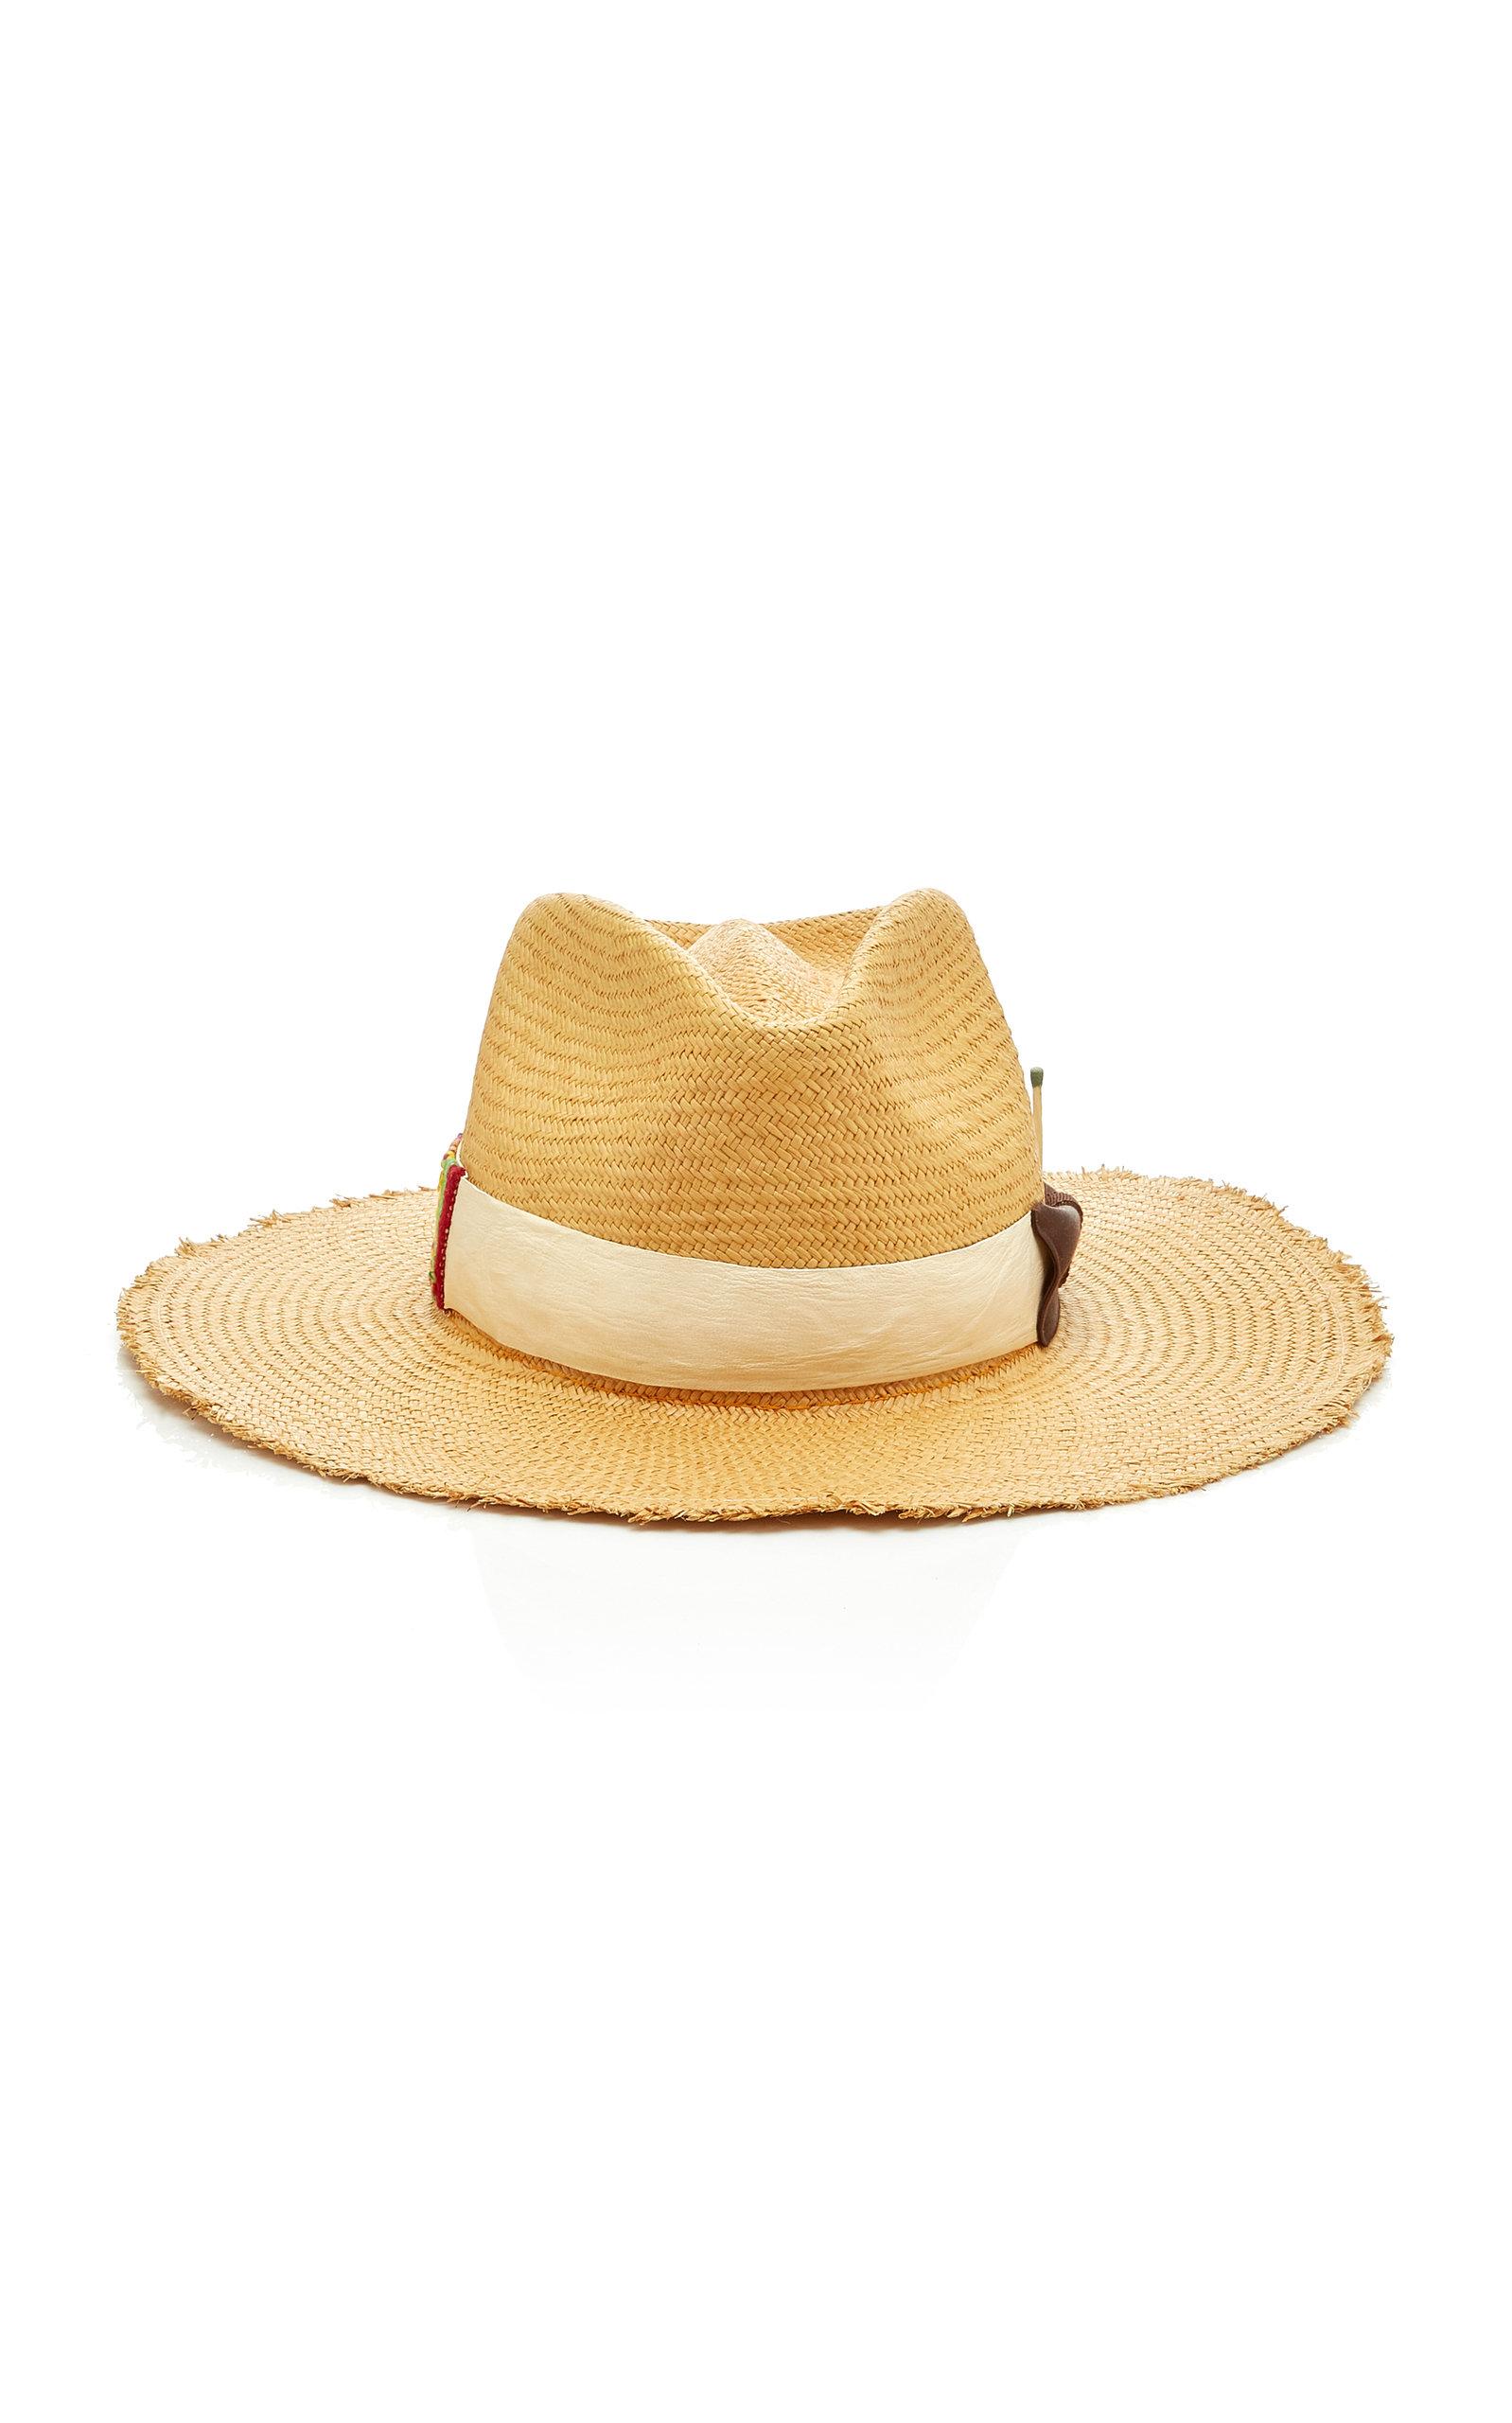 NICK FOUQUET | Nick Fouquet Melisande Grosgrain-Trimmed Straw Hat | Goxip